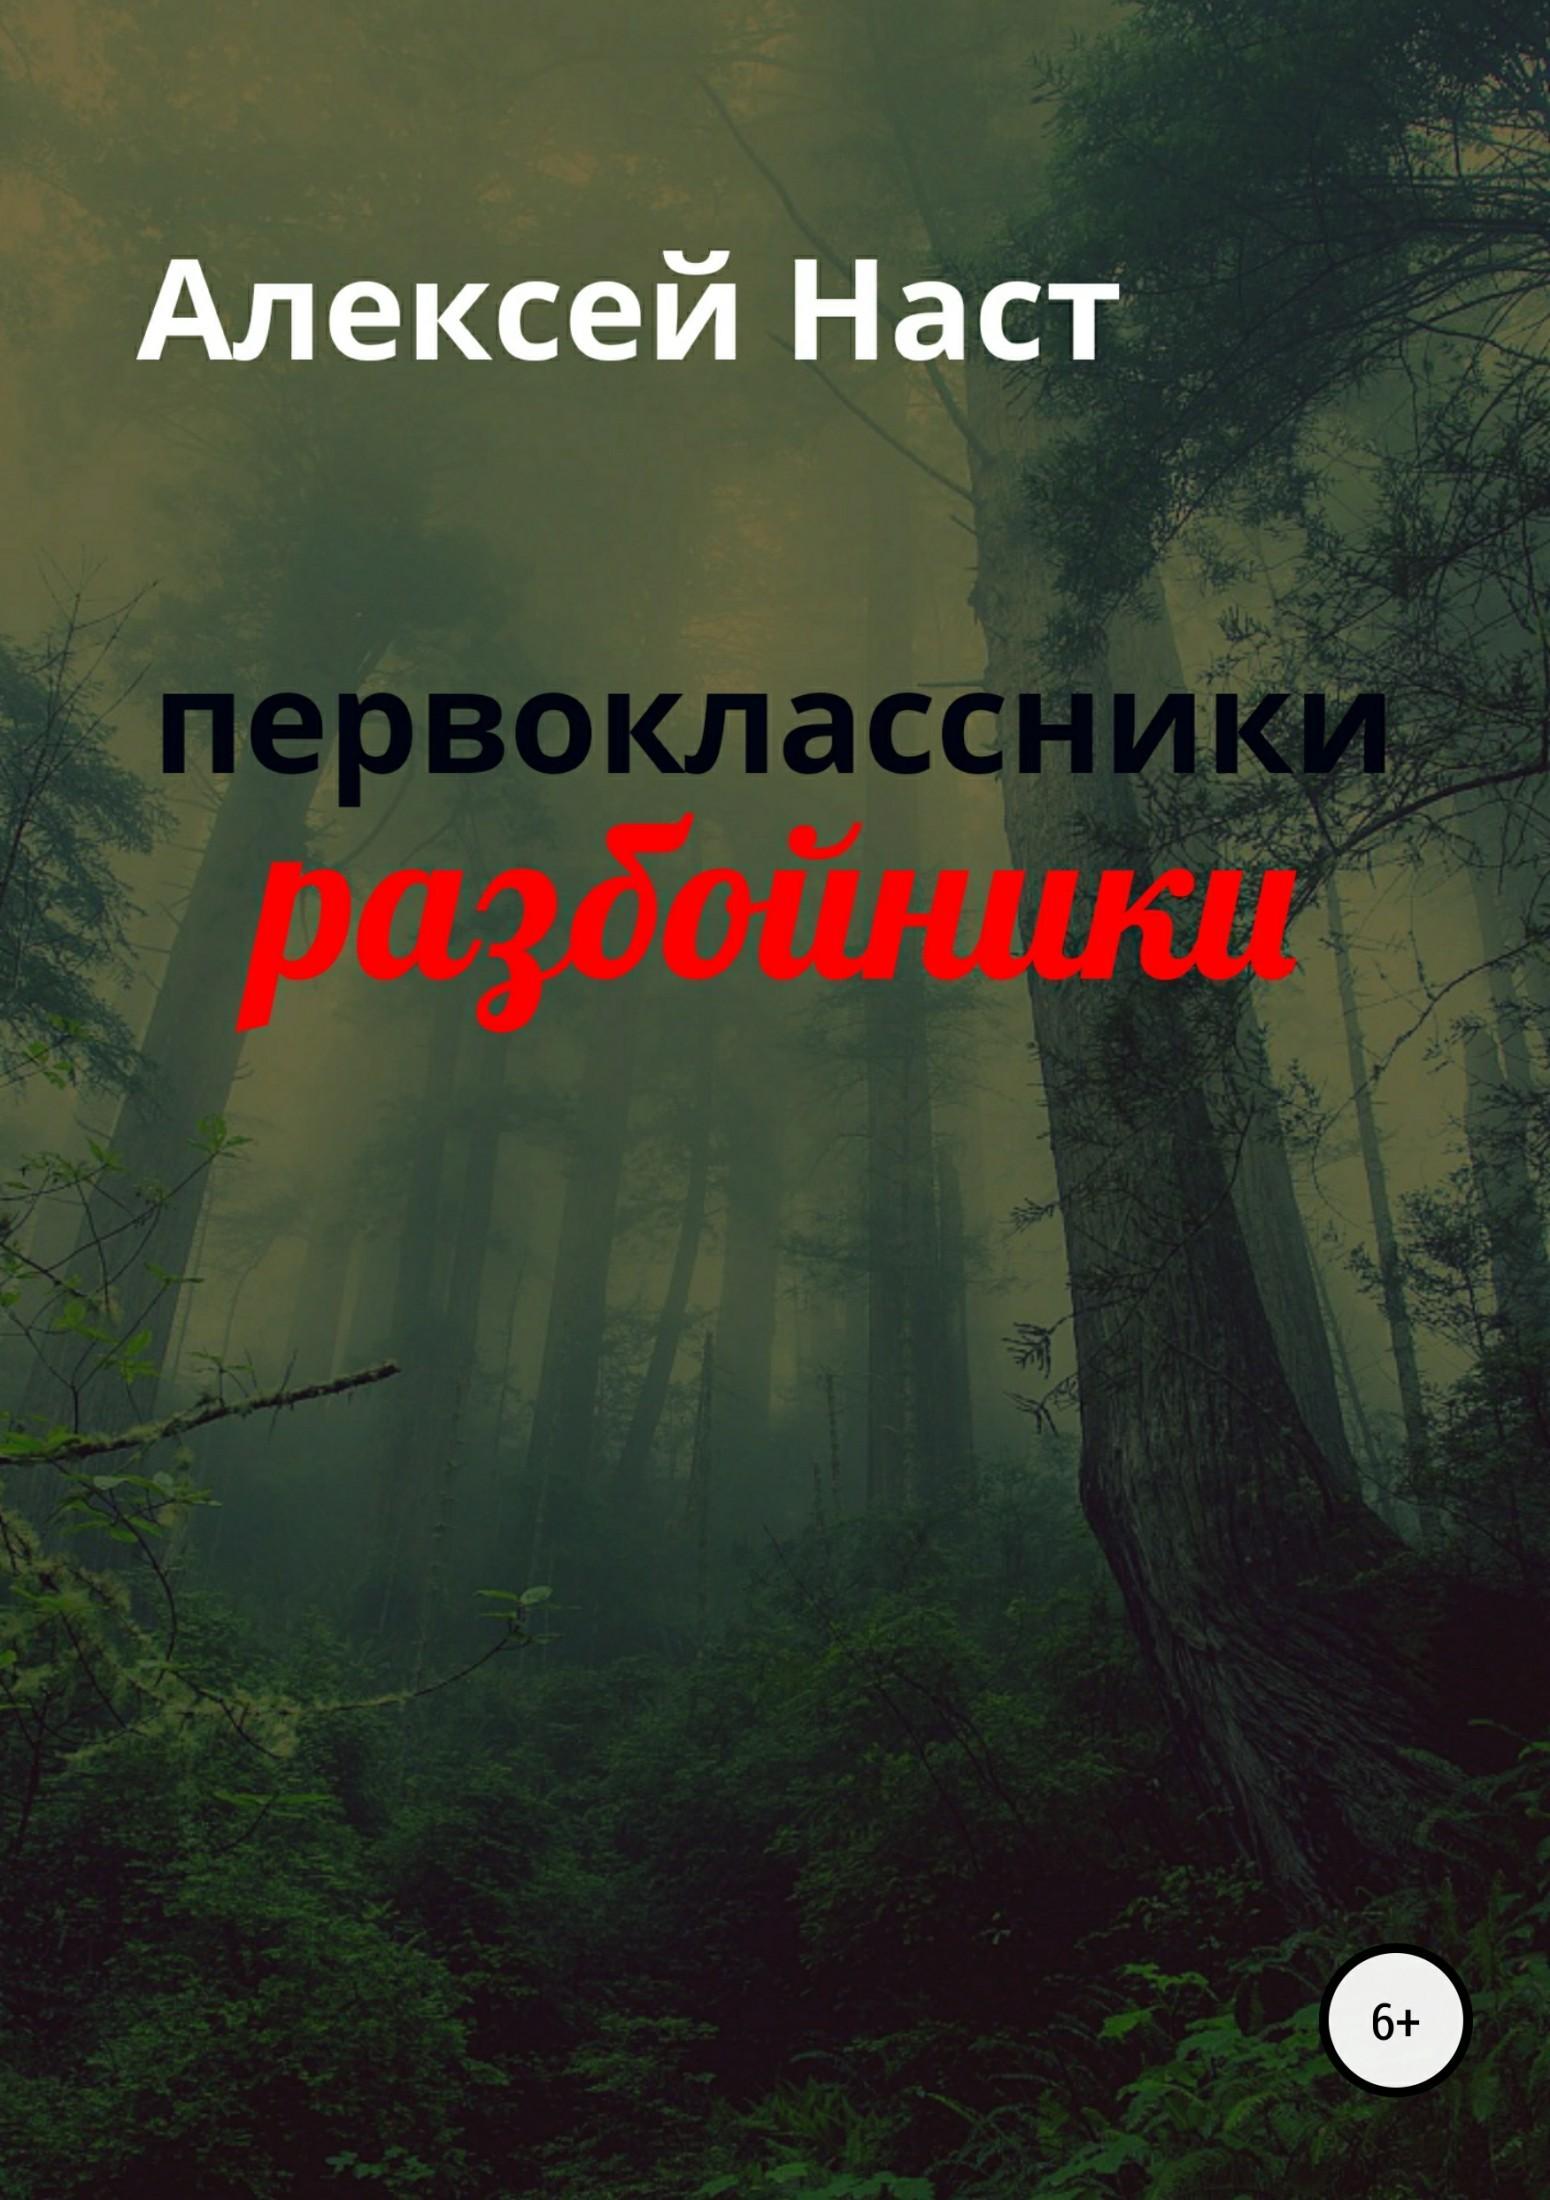 Алексей Наст - первоклассники разбойники